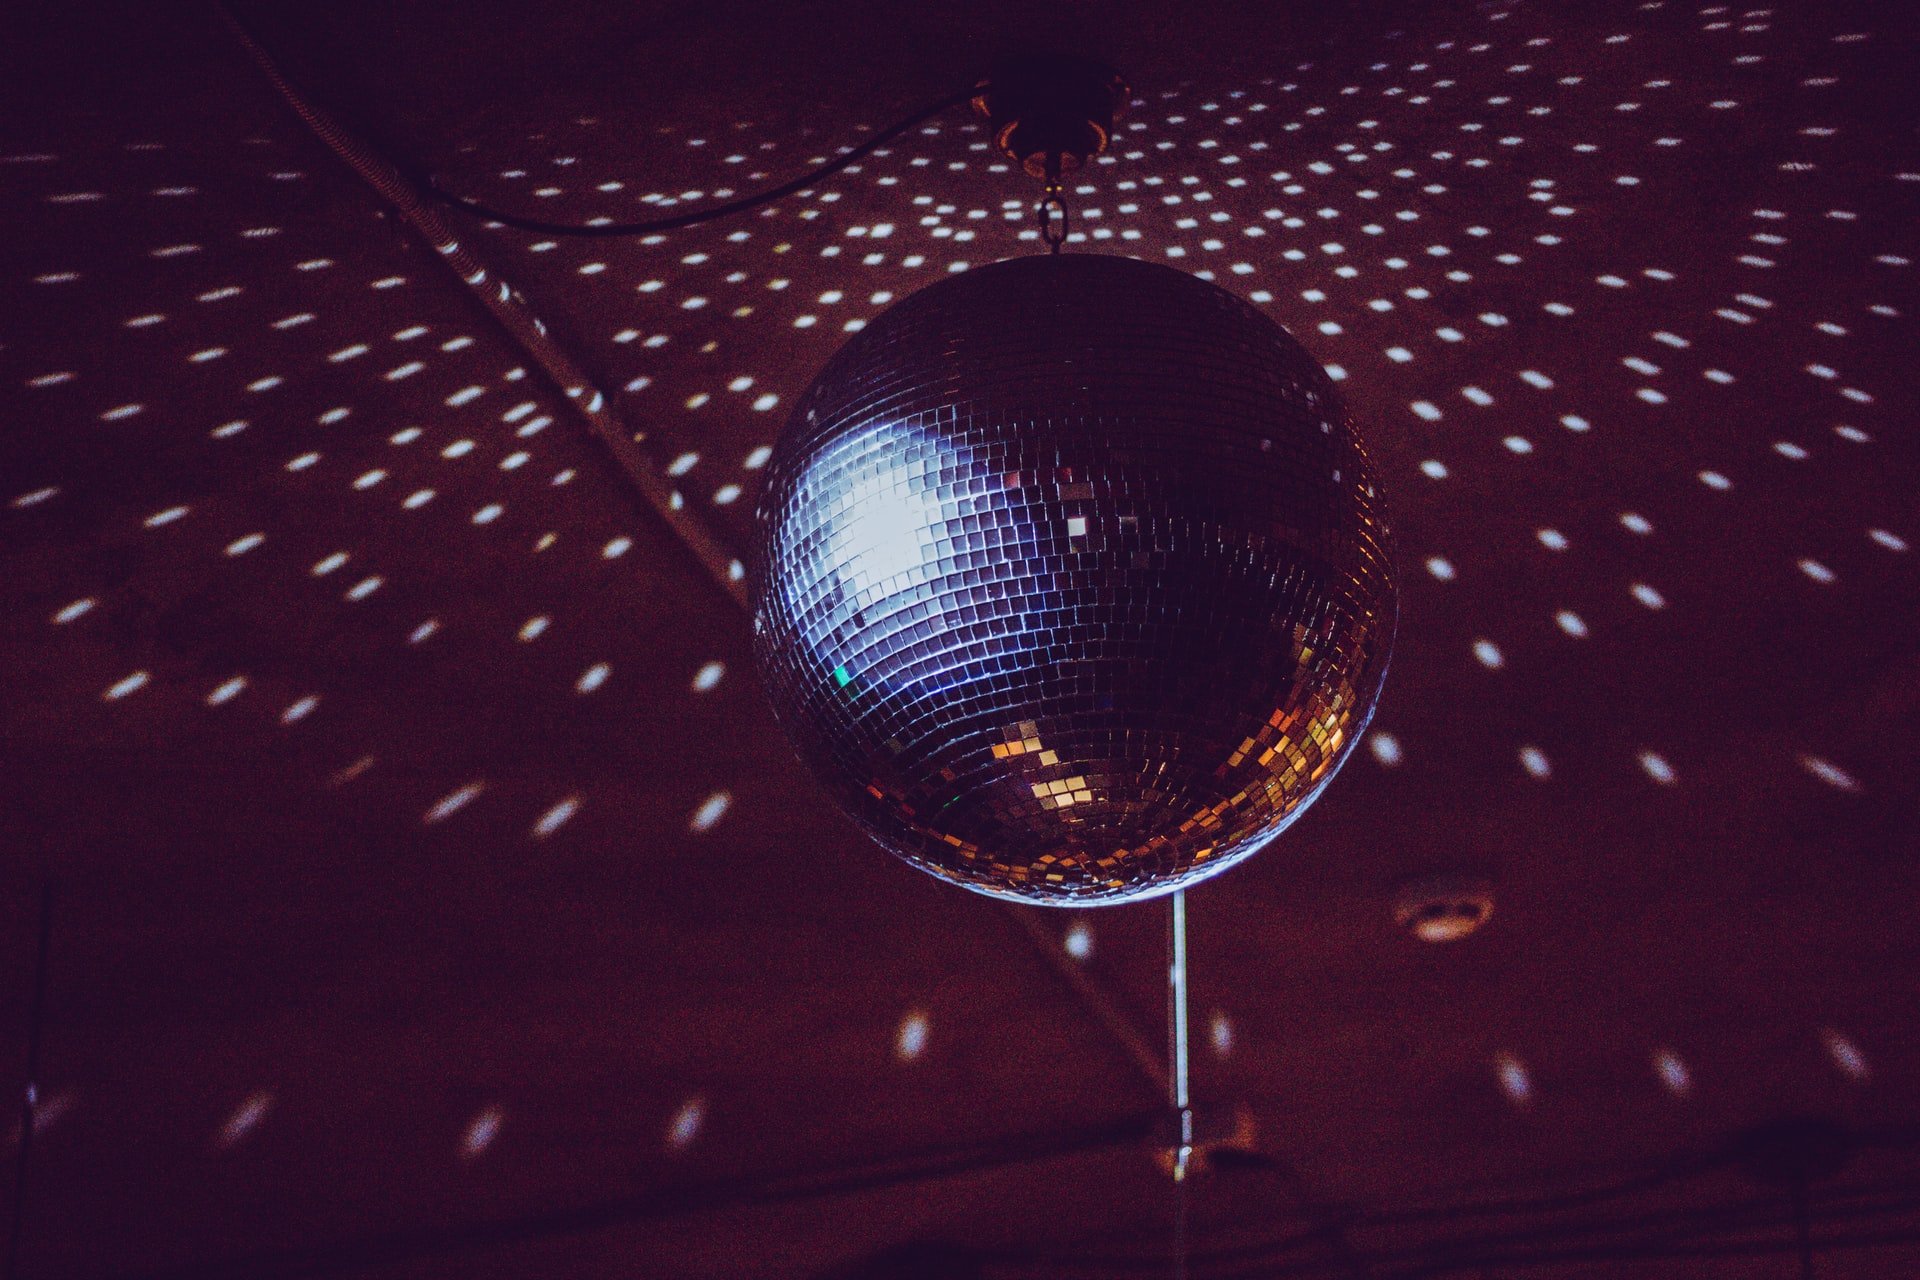 lights on a mirror ball and disco ball